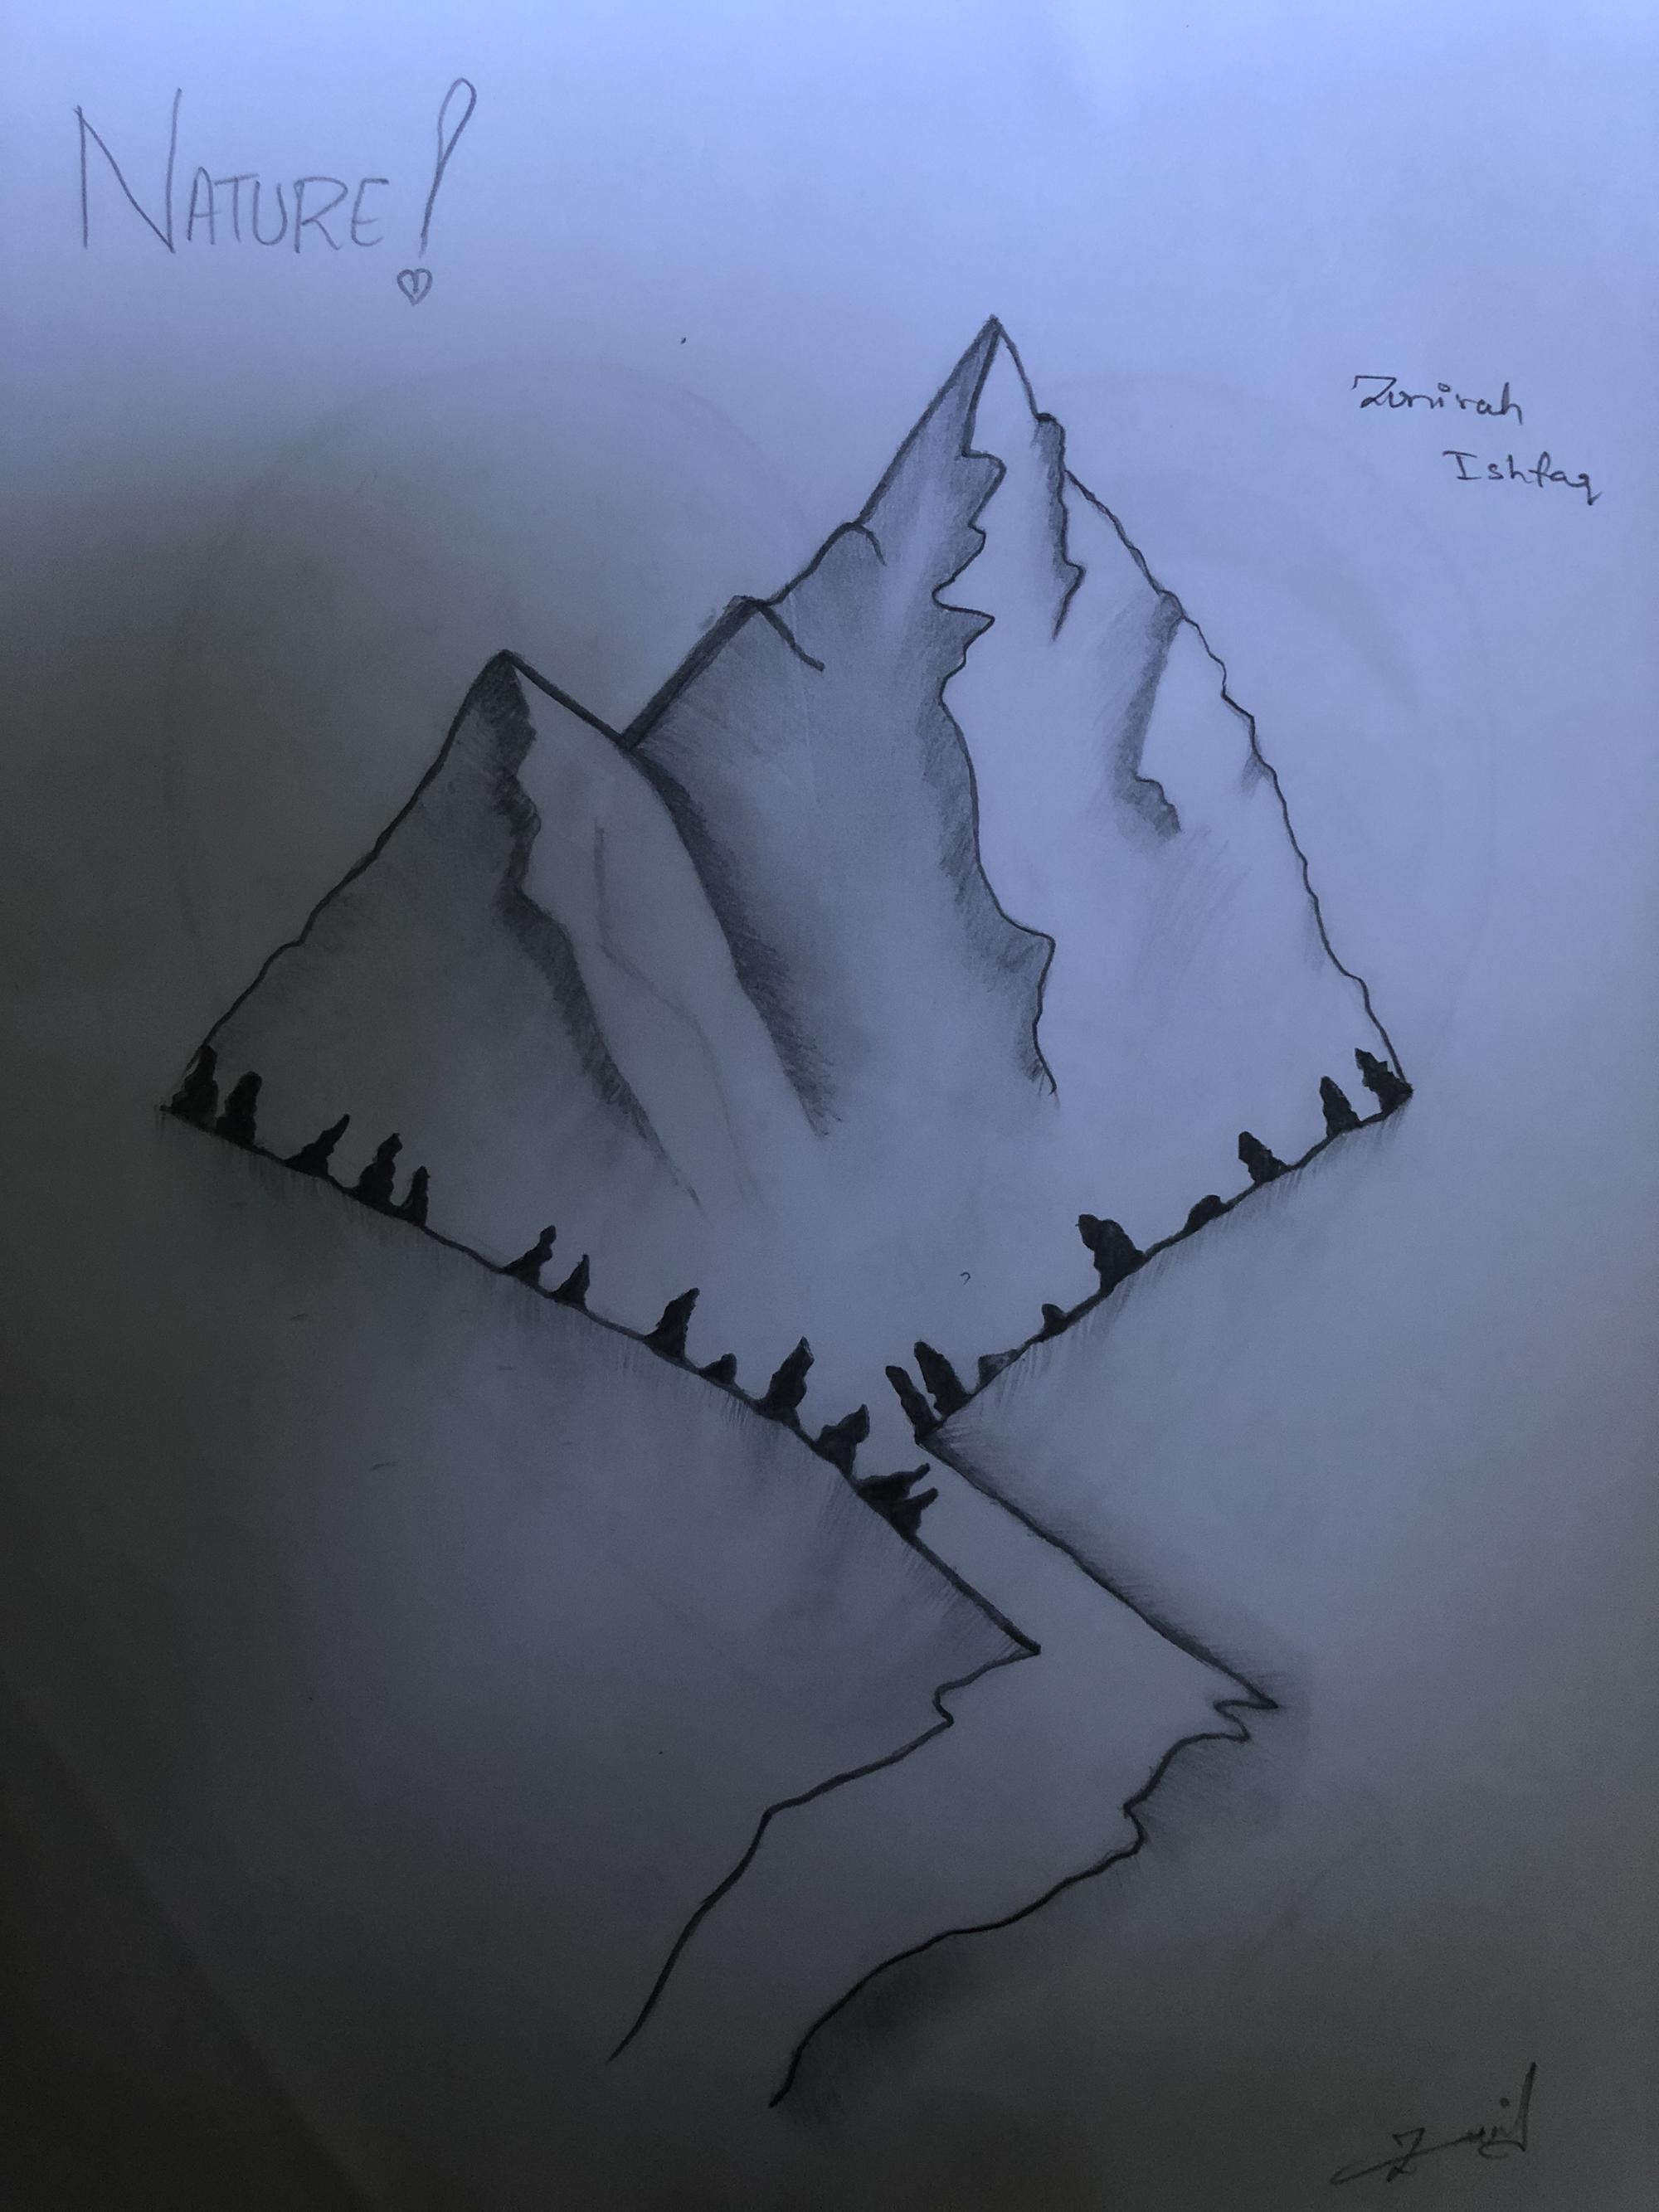 2nd. Zunirah Ishfaq, Drawing #11